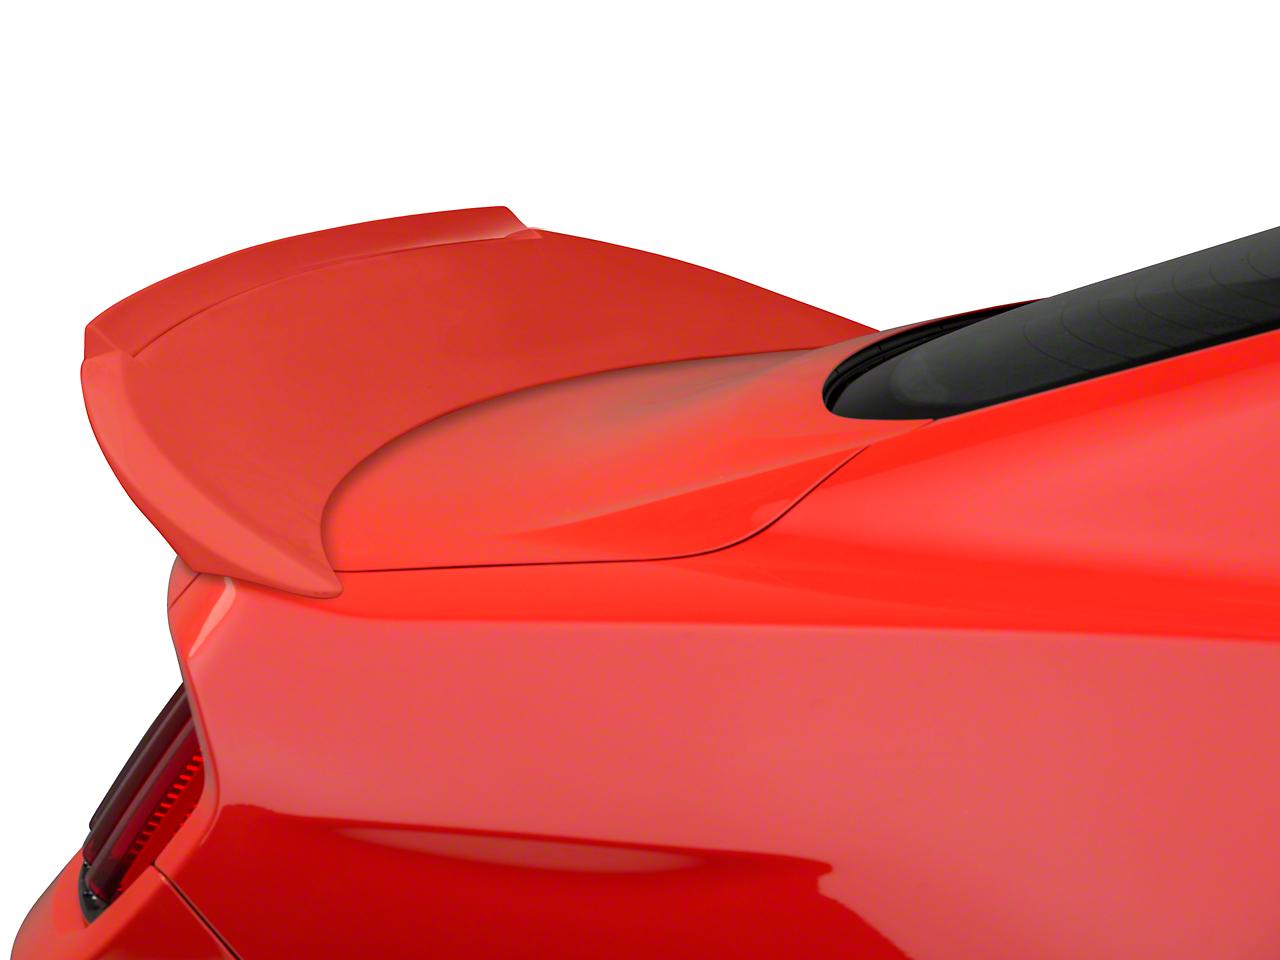 Trufiber Fiberglass Rear Spoiler w/ Gurney Flap - Fastback - Unpainted (15-17 GT, V6, EcoBoost)